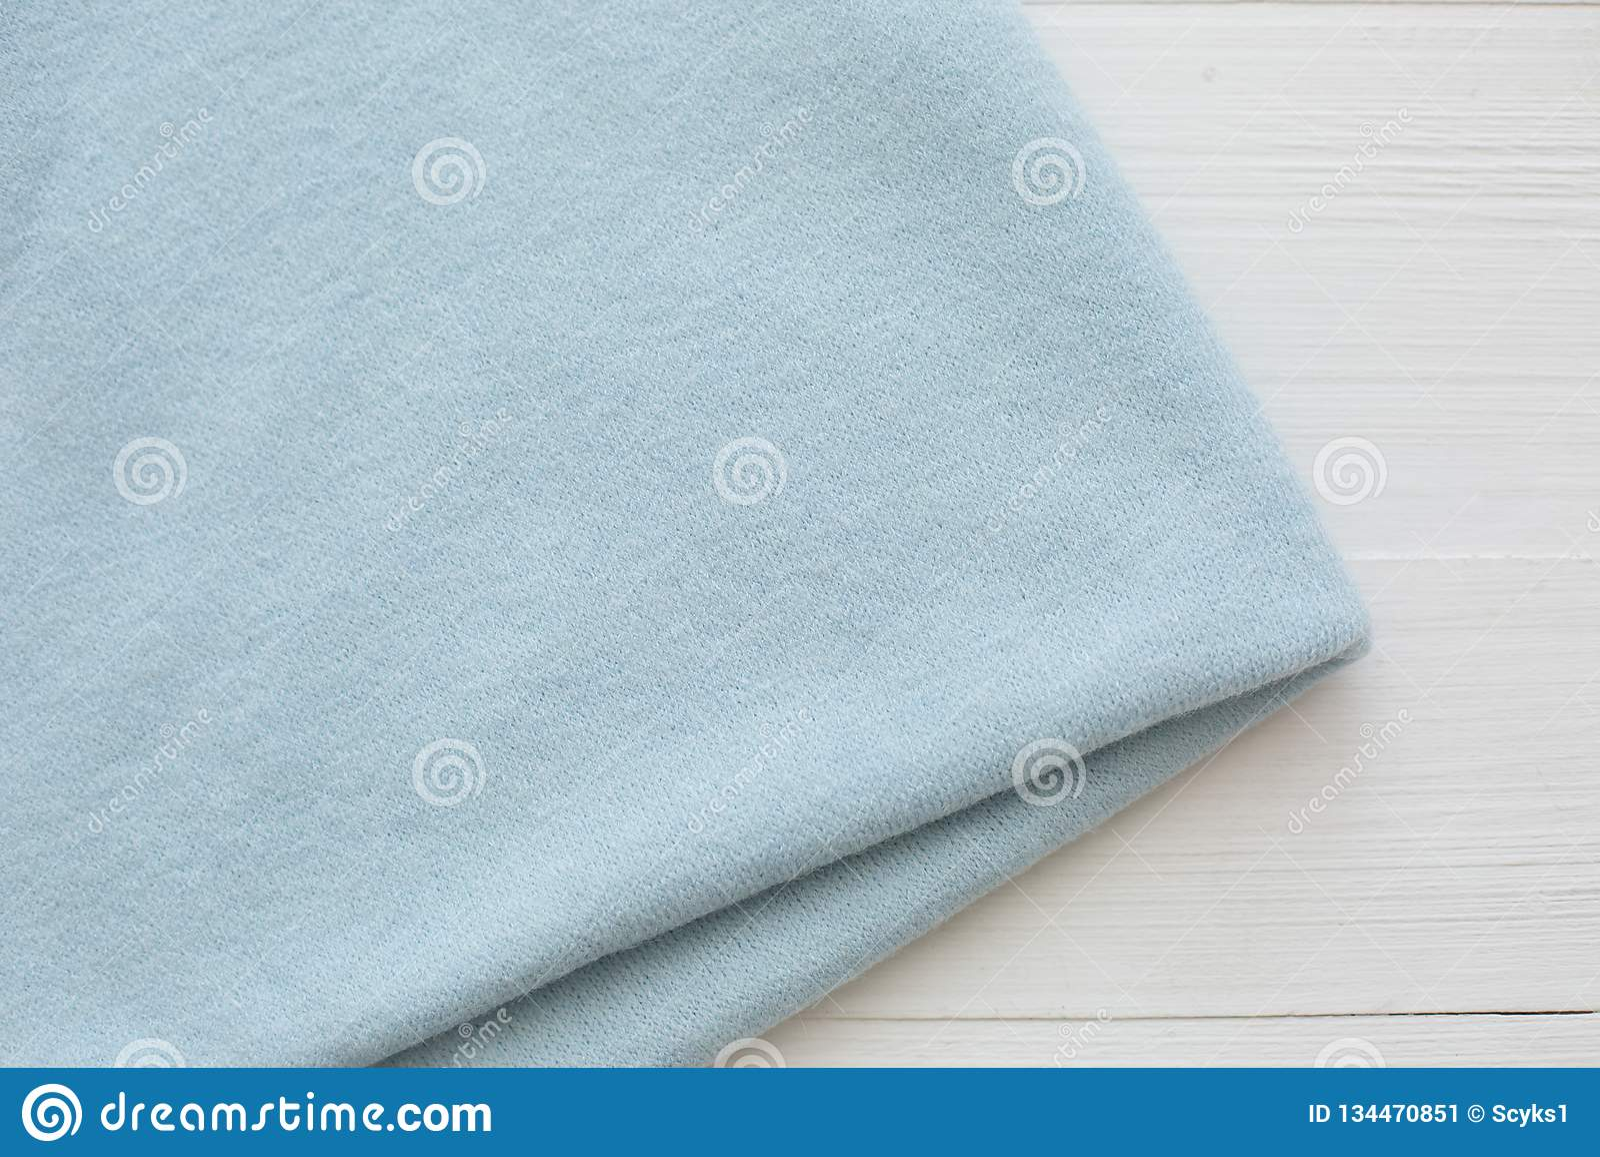 Blauwe kleur gebreide stof op witte achtergrond